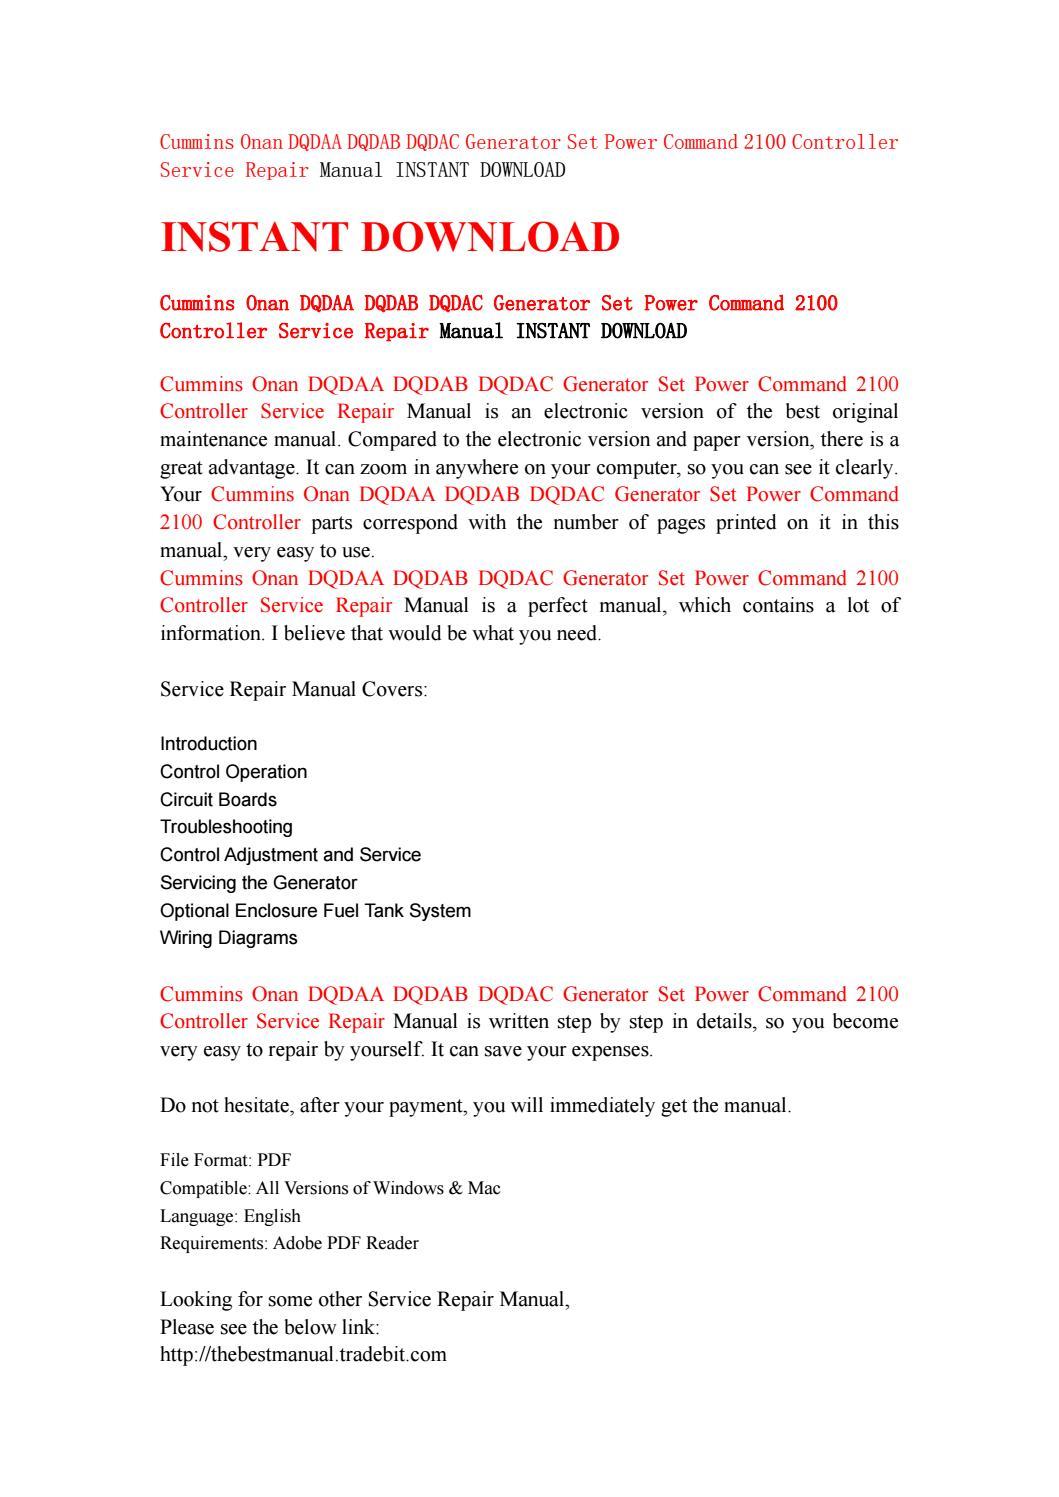 Cummins onan dqdaa dqdab dqdac generator set power command 2100 controller  service repair manual ins by jhsefnhse76 - issuu